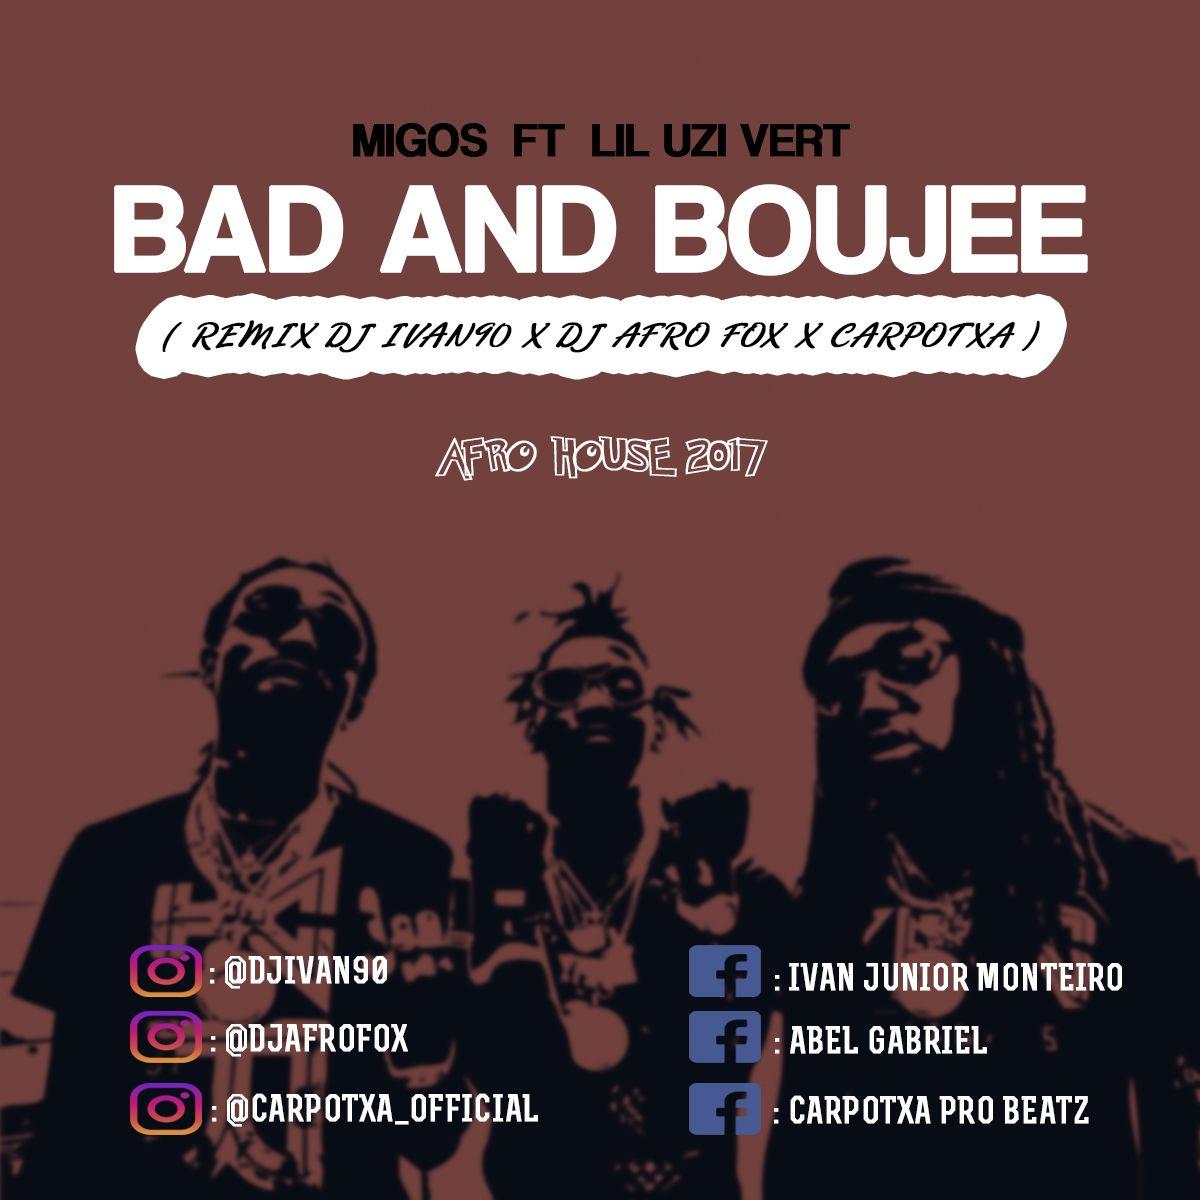 Bad And Boujee ( Remix Dj Ivan90 x Dj Afro Fox x Carpotxa ) by Migos